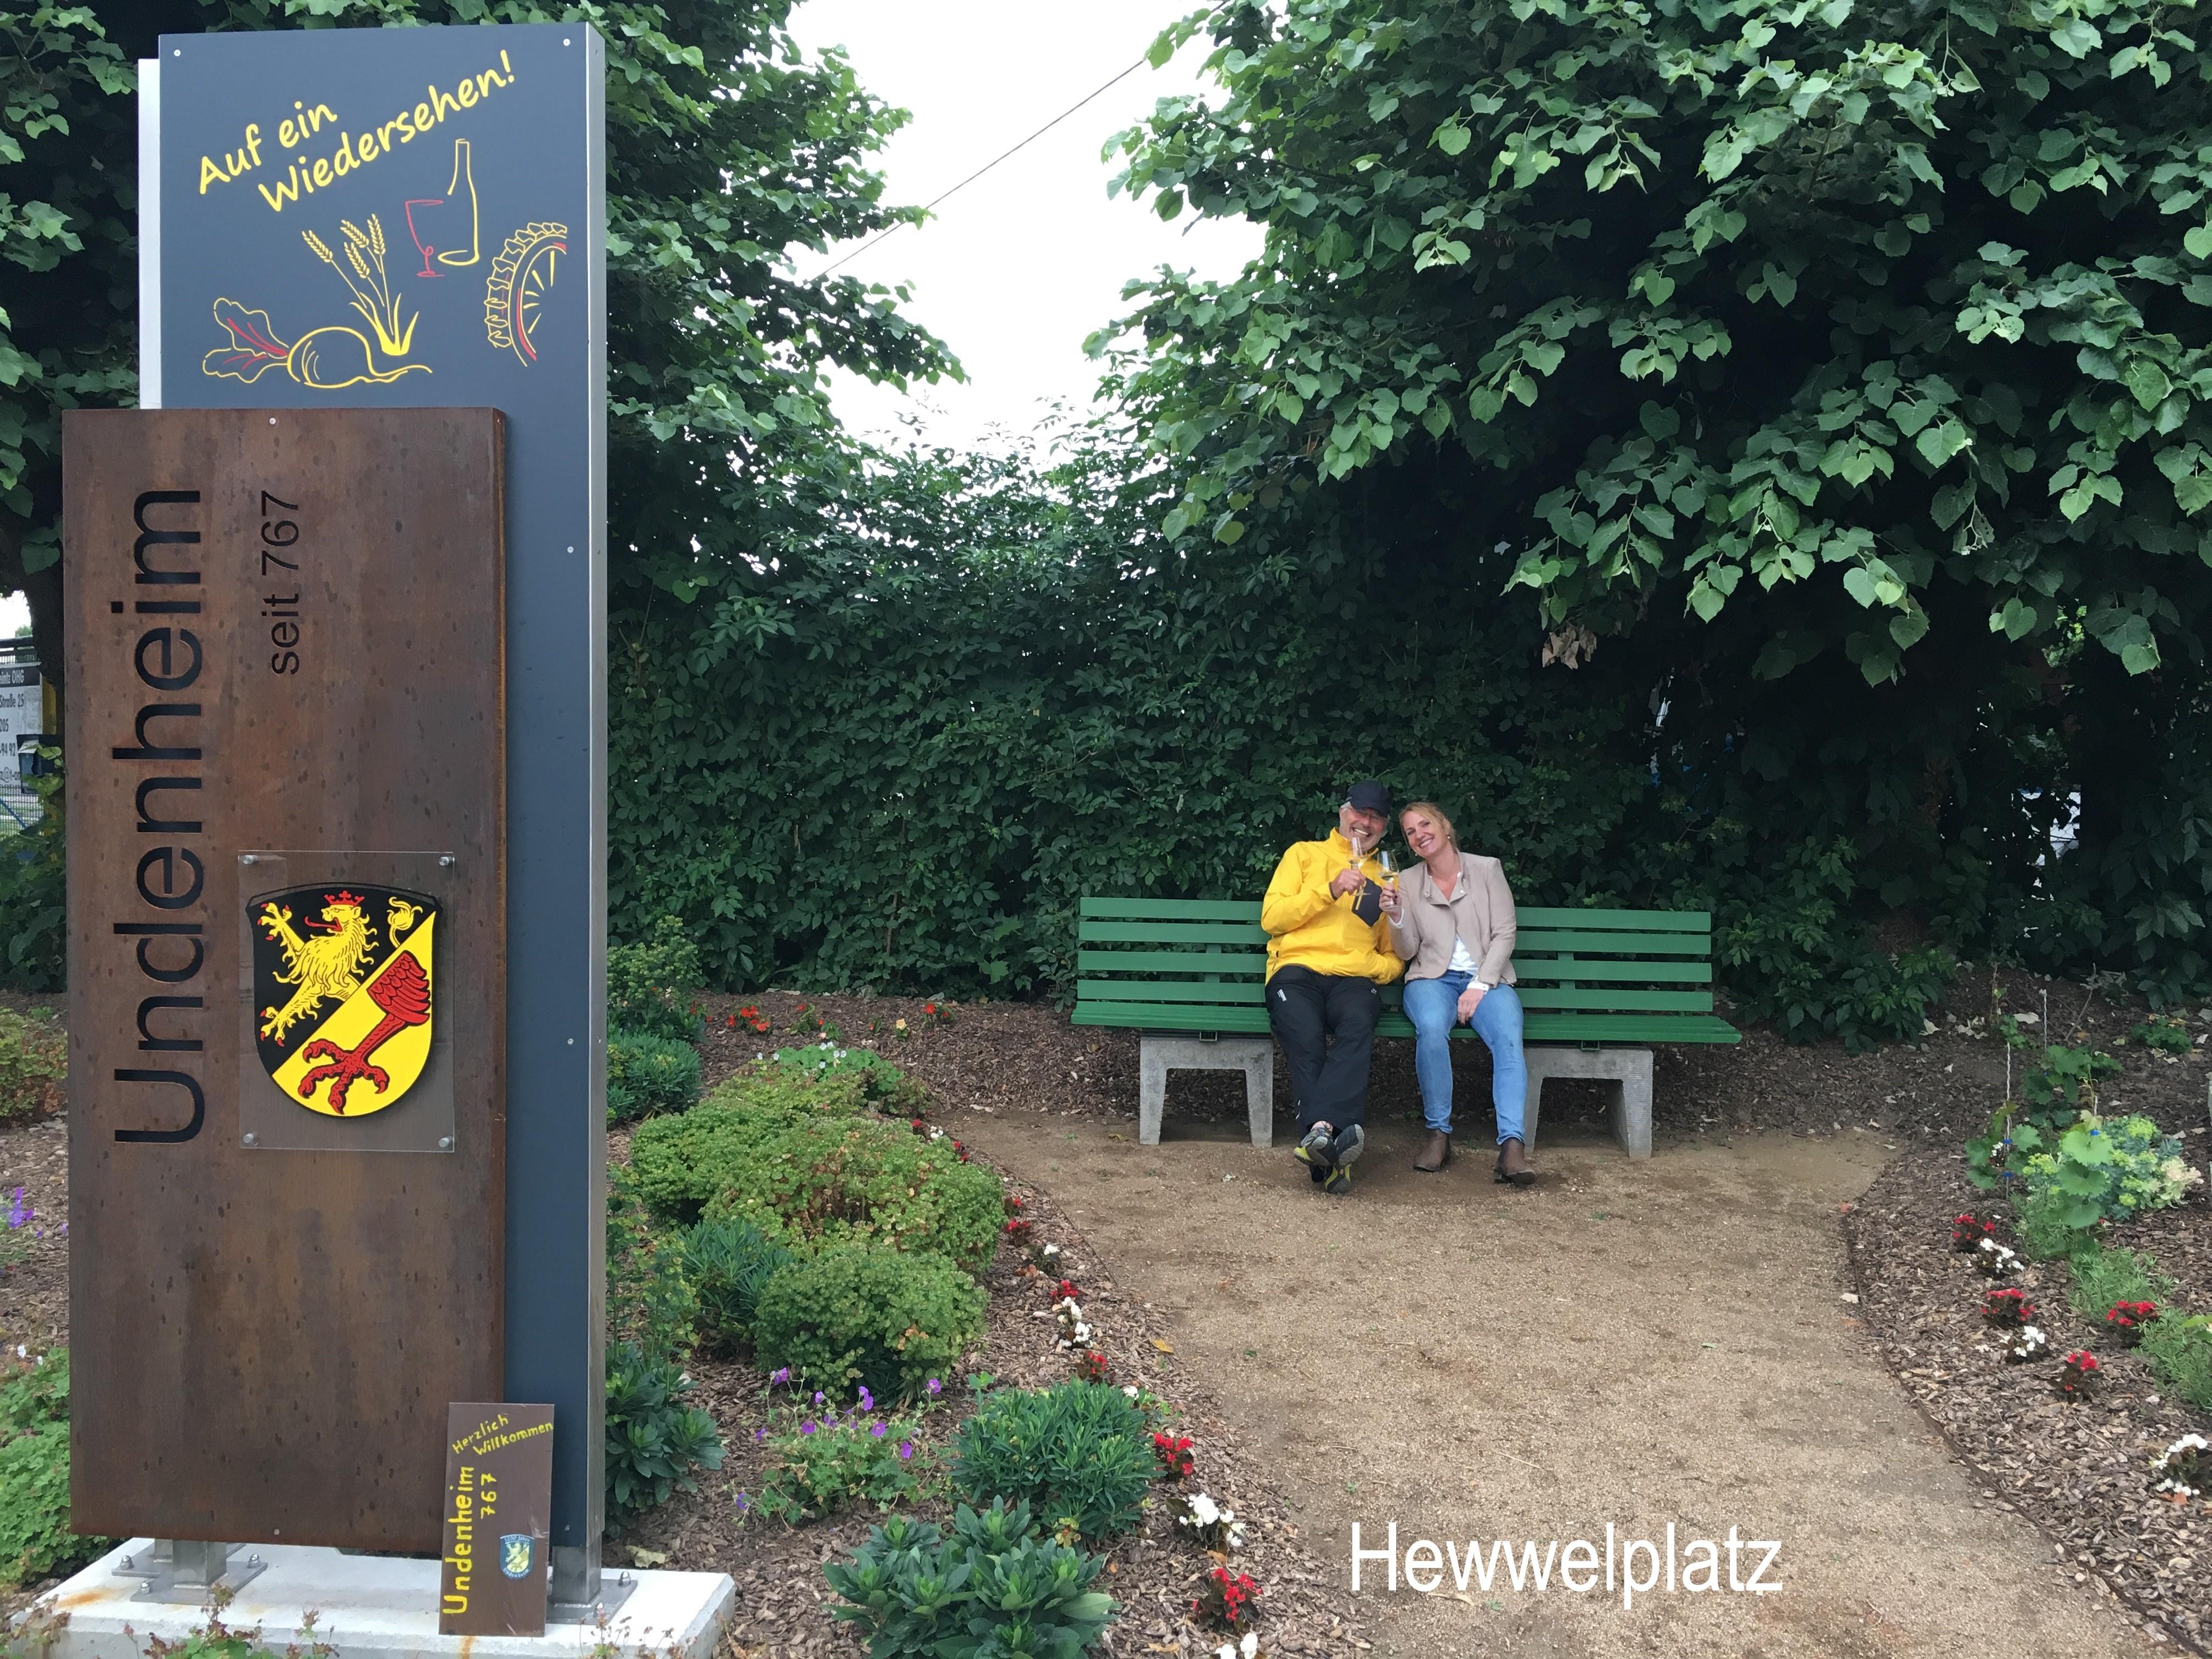 Hewwelplatz